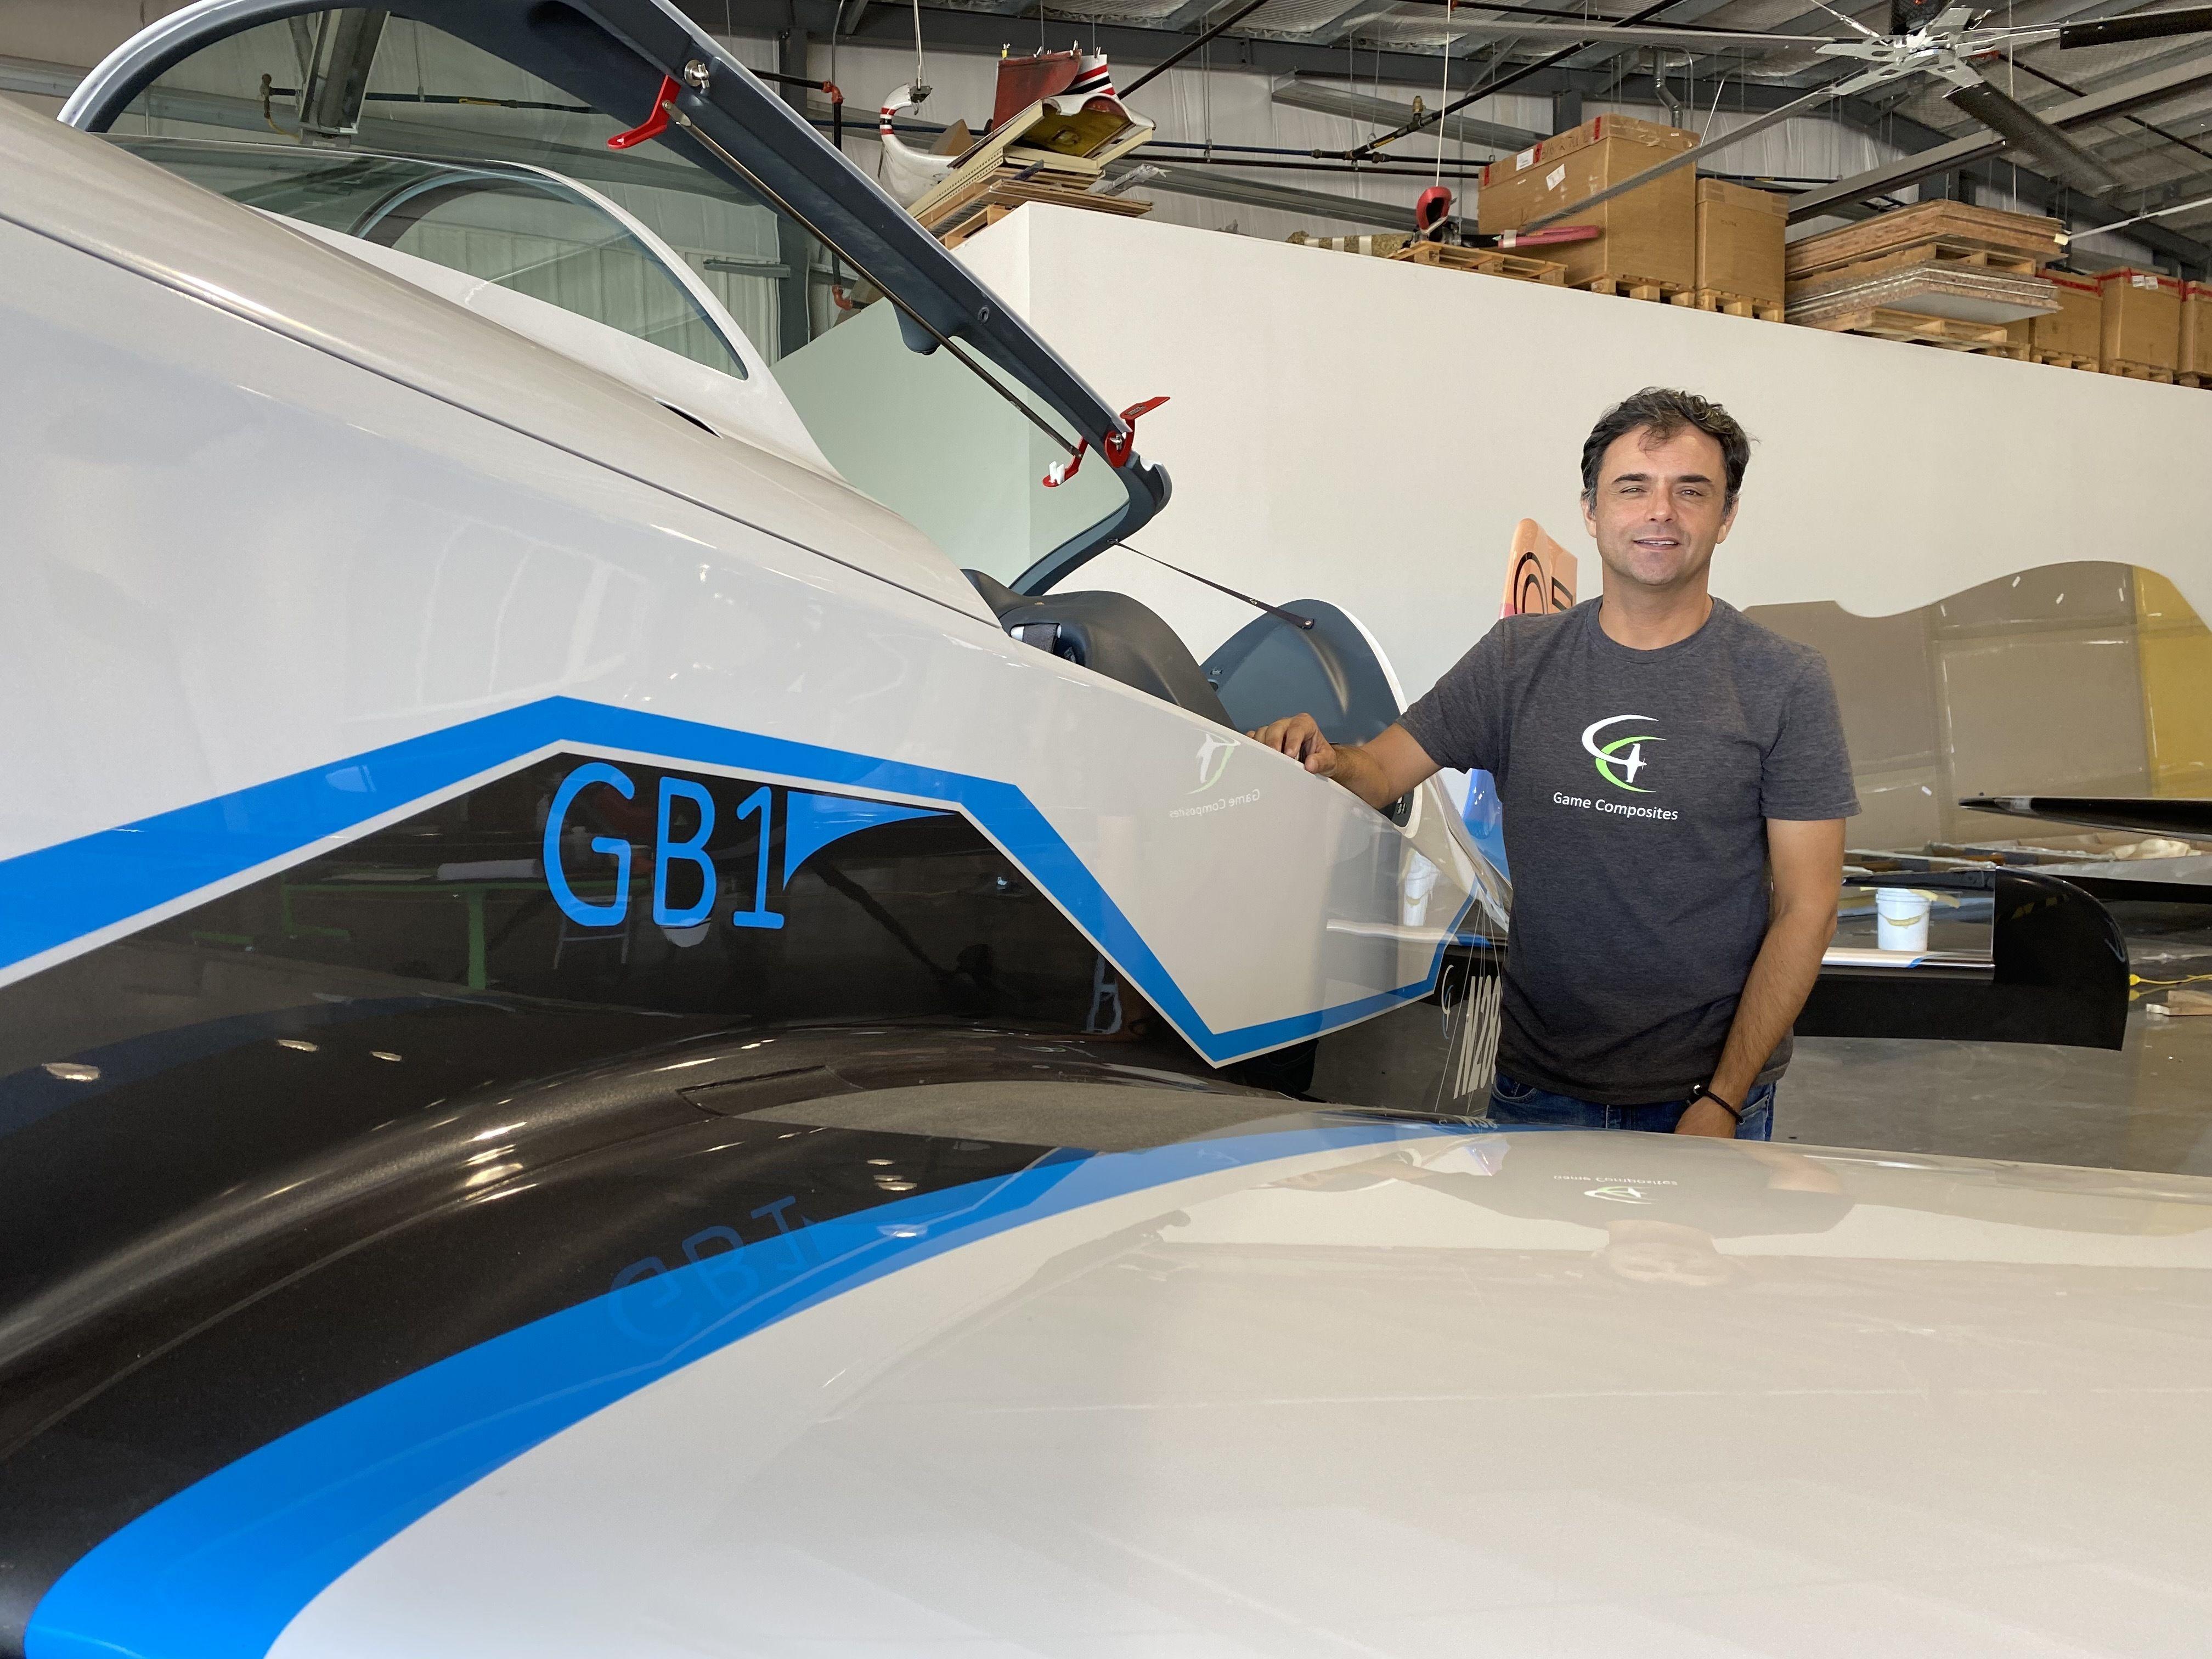 Cristain Bolton, a test pilot, shows of a GameBird 1.